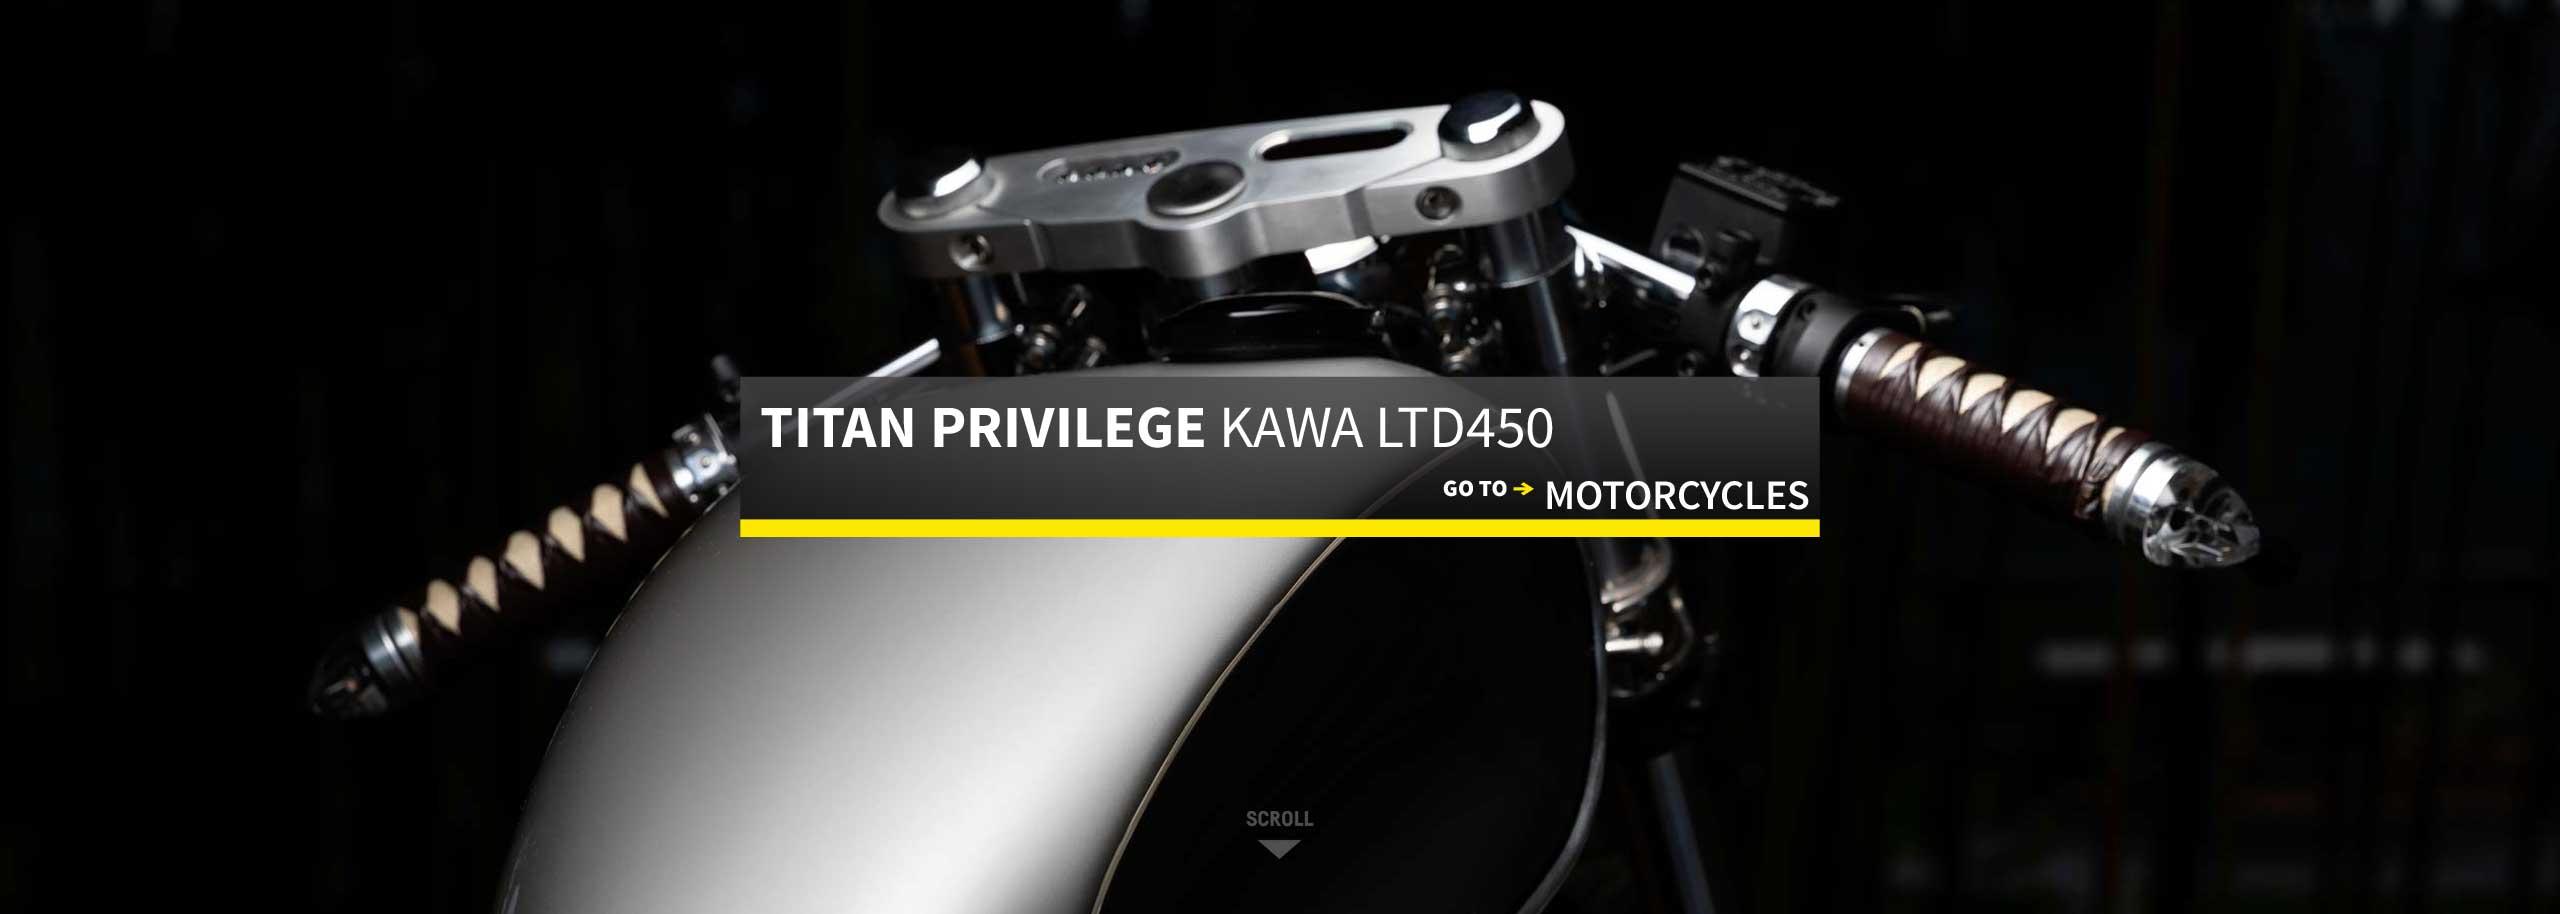 Titan-Motorcycles_TITAN-Privilege-Kawasaki-LTD-EN-450-CafeRacer-CustomBike-Graz-Austria-Kinderkrebshilfe-Mit-Herz